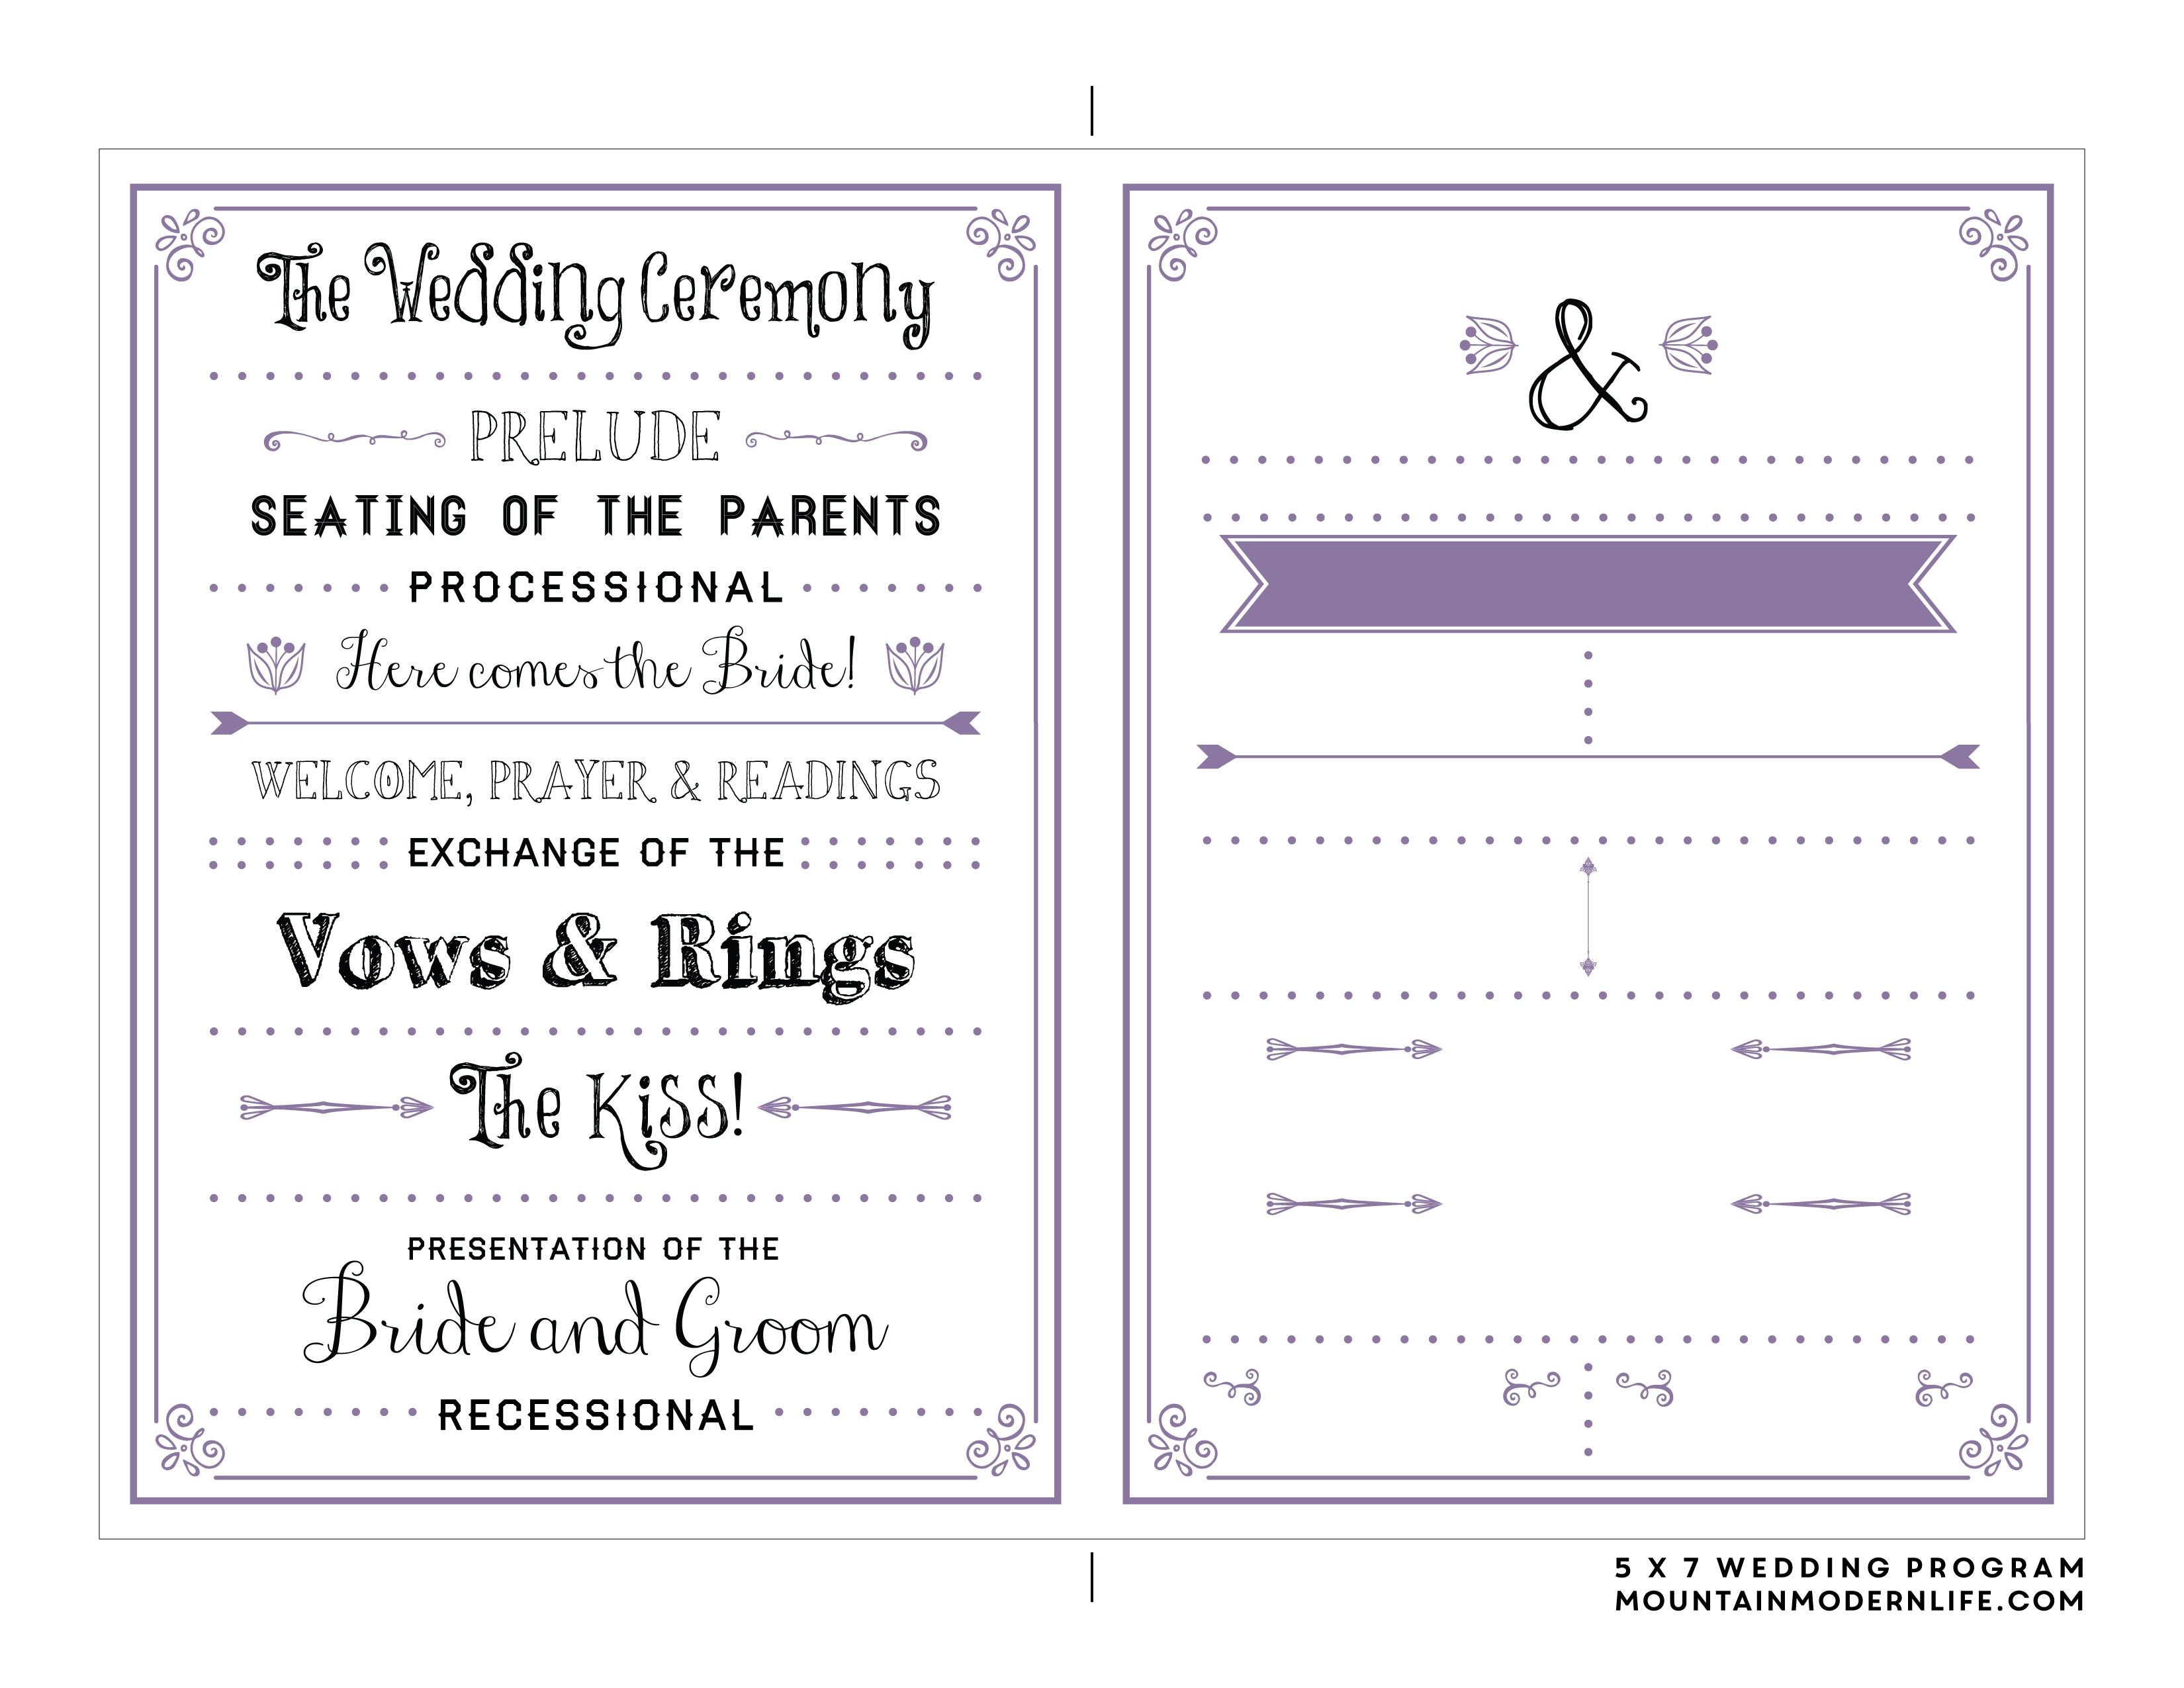 Free Printable Wedding Program Templates | Bestprintable231118 - Free Printable Wedding Program Templates